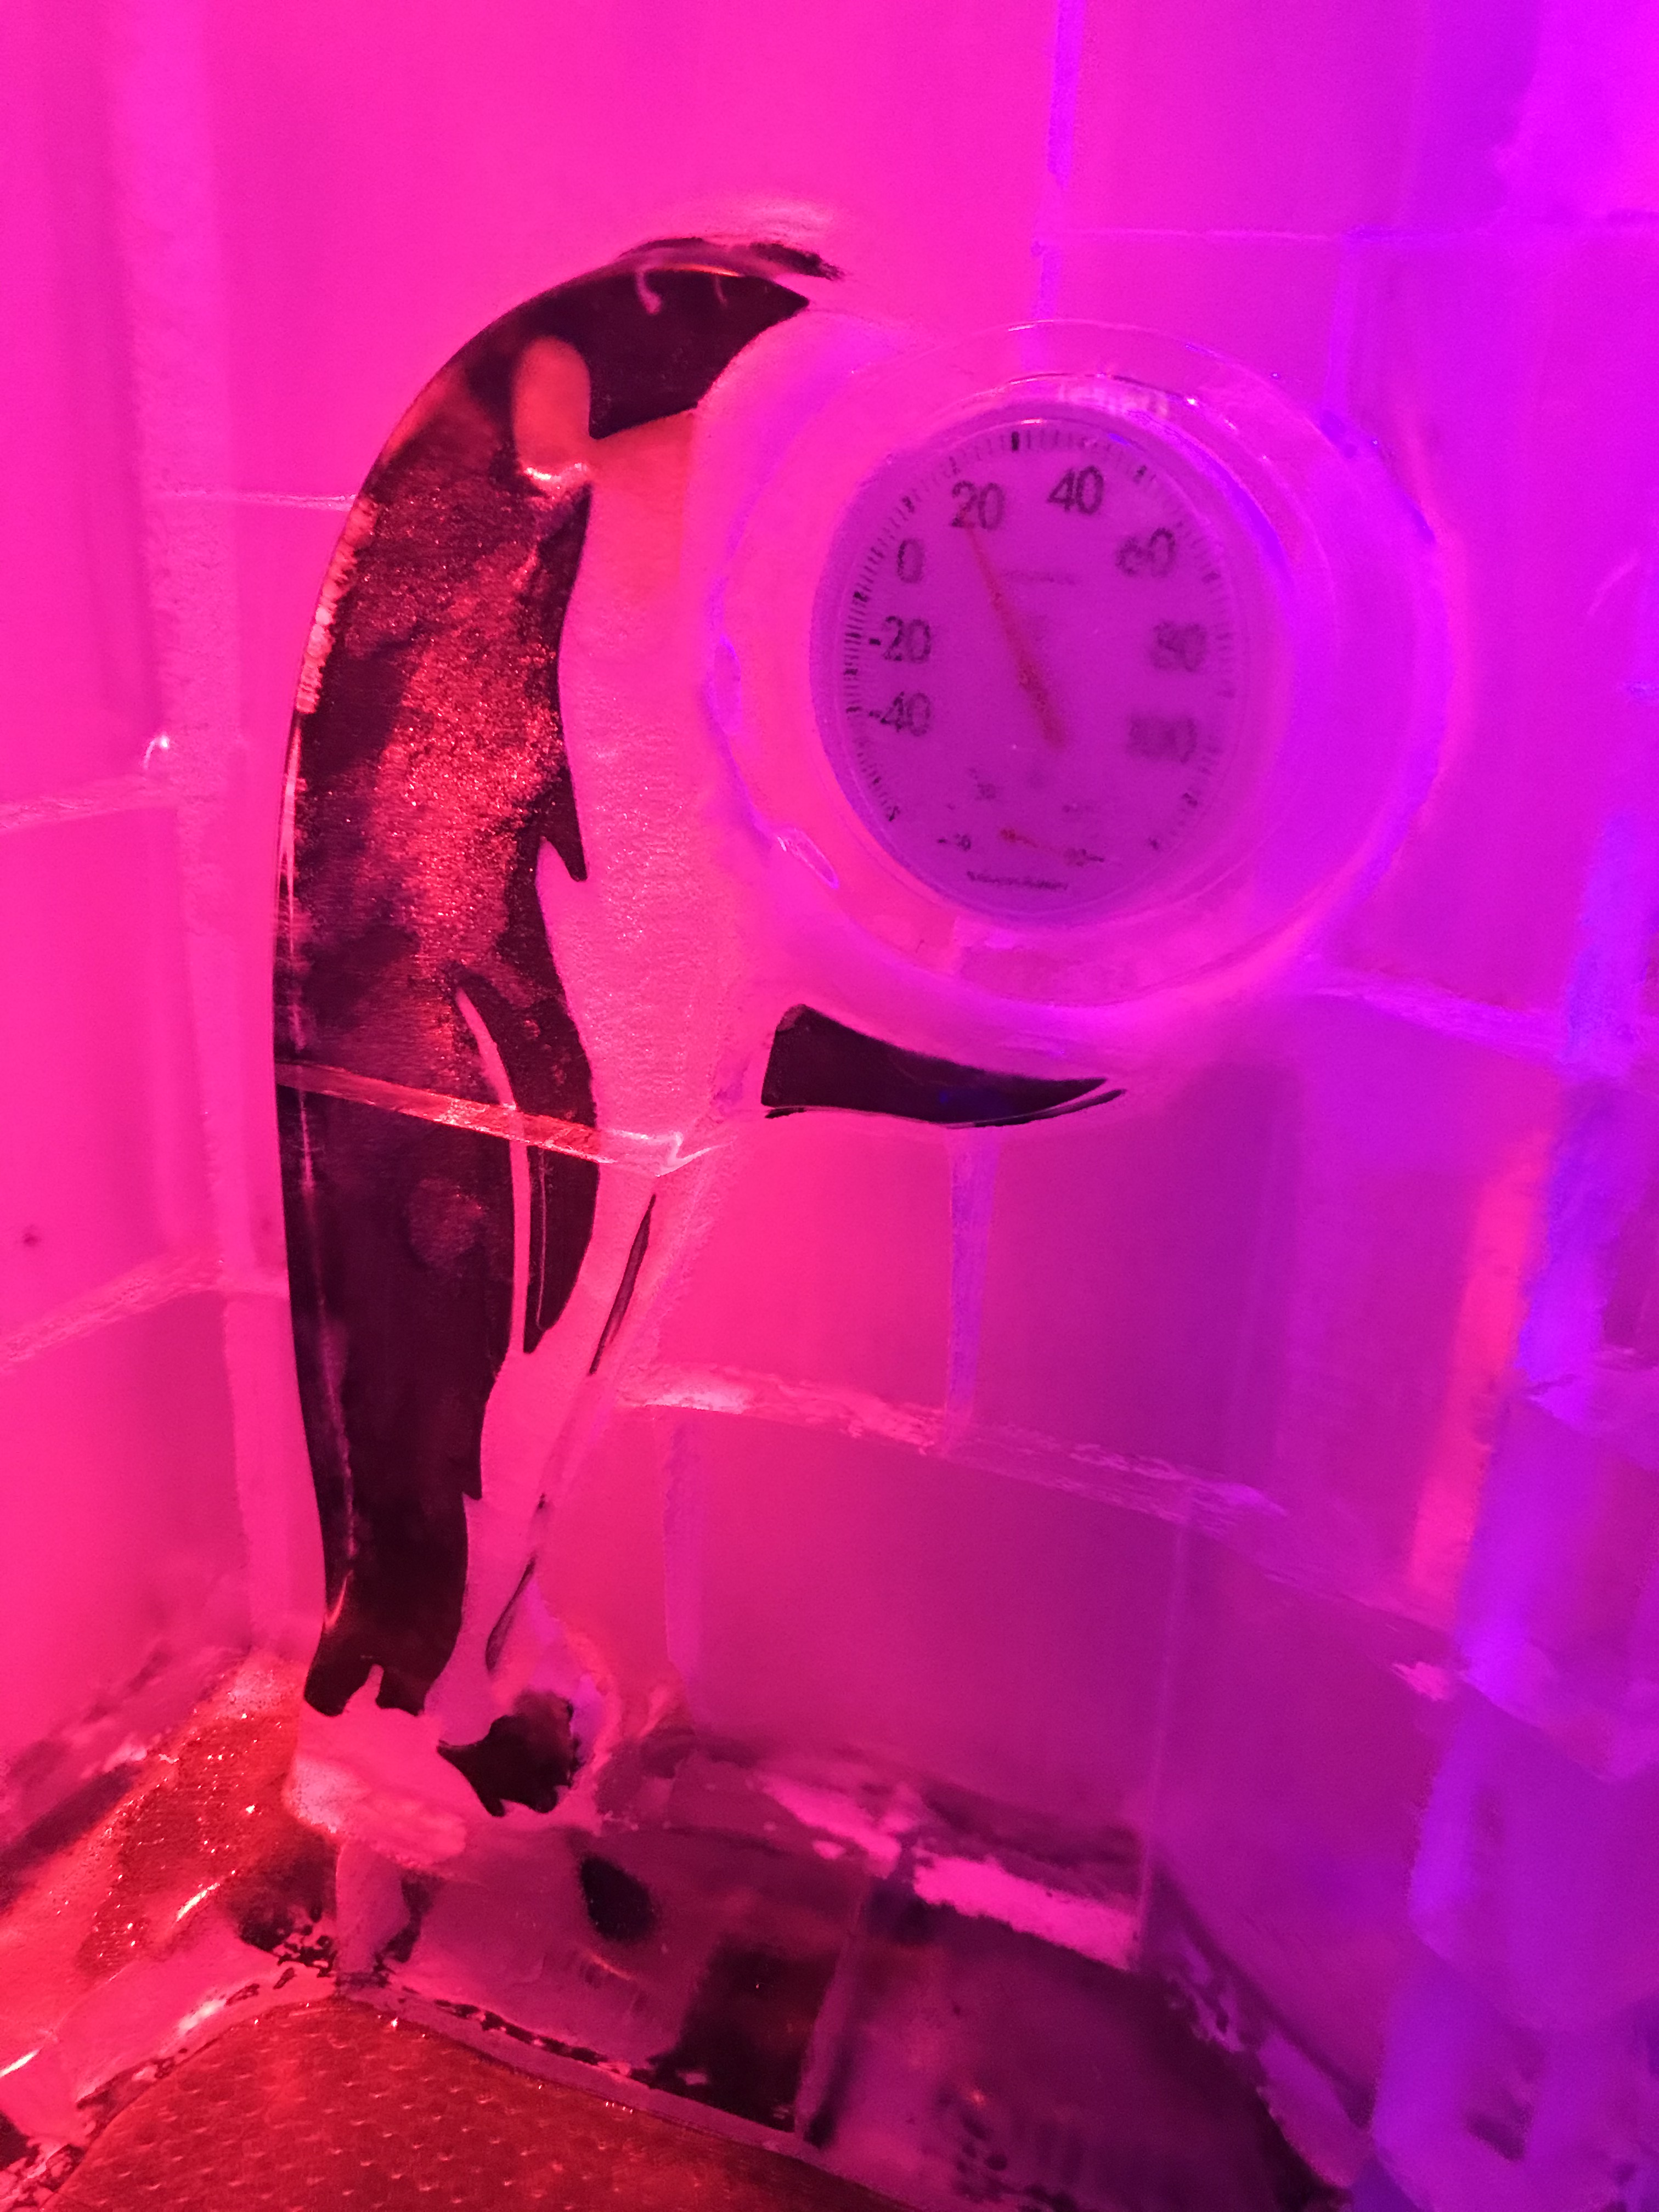 Penguin Holding the ICEBAR Orlando Thermostat